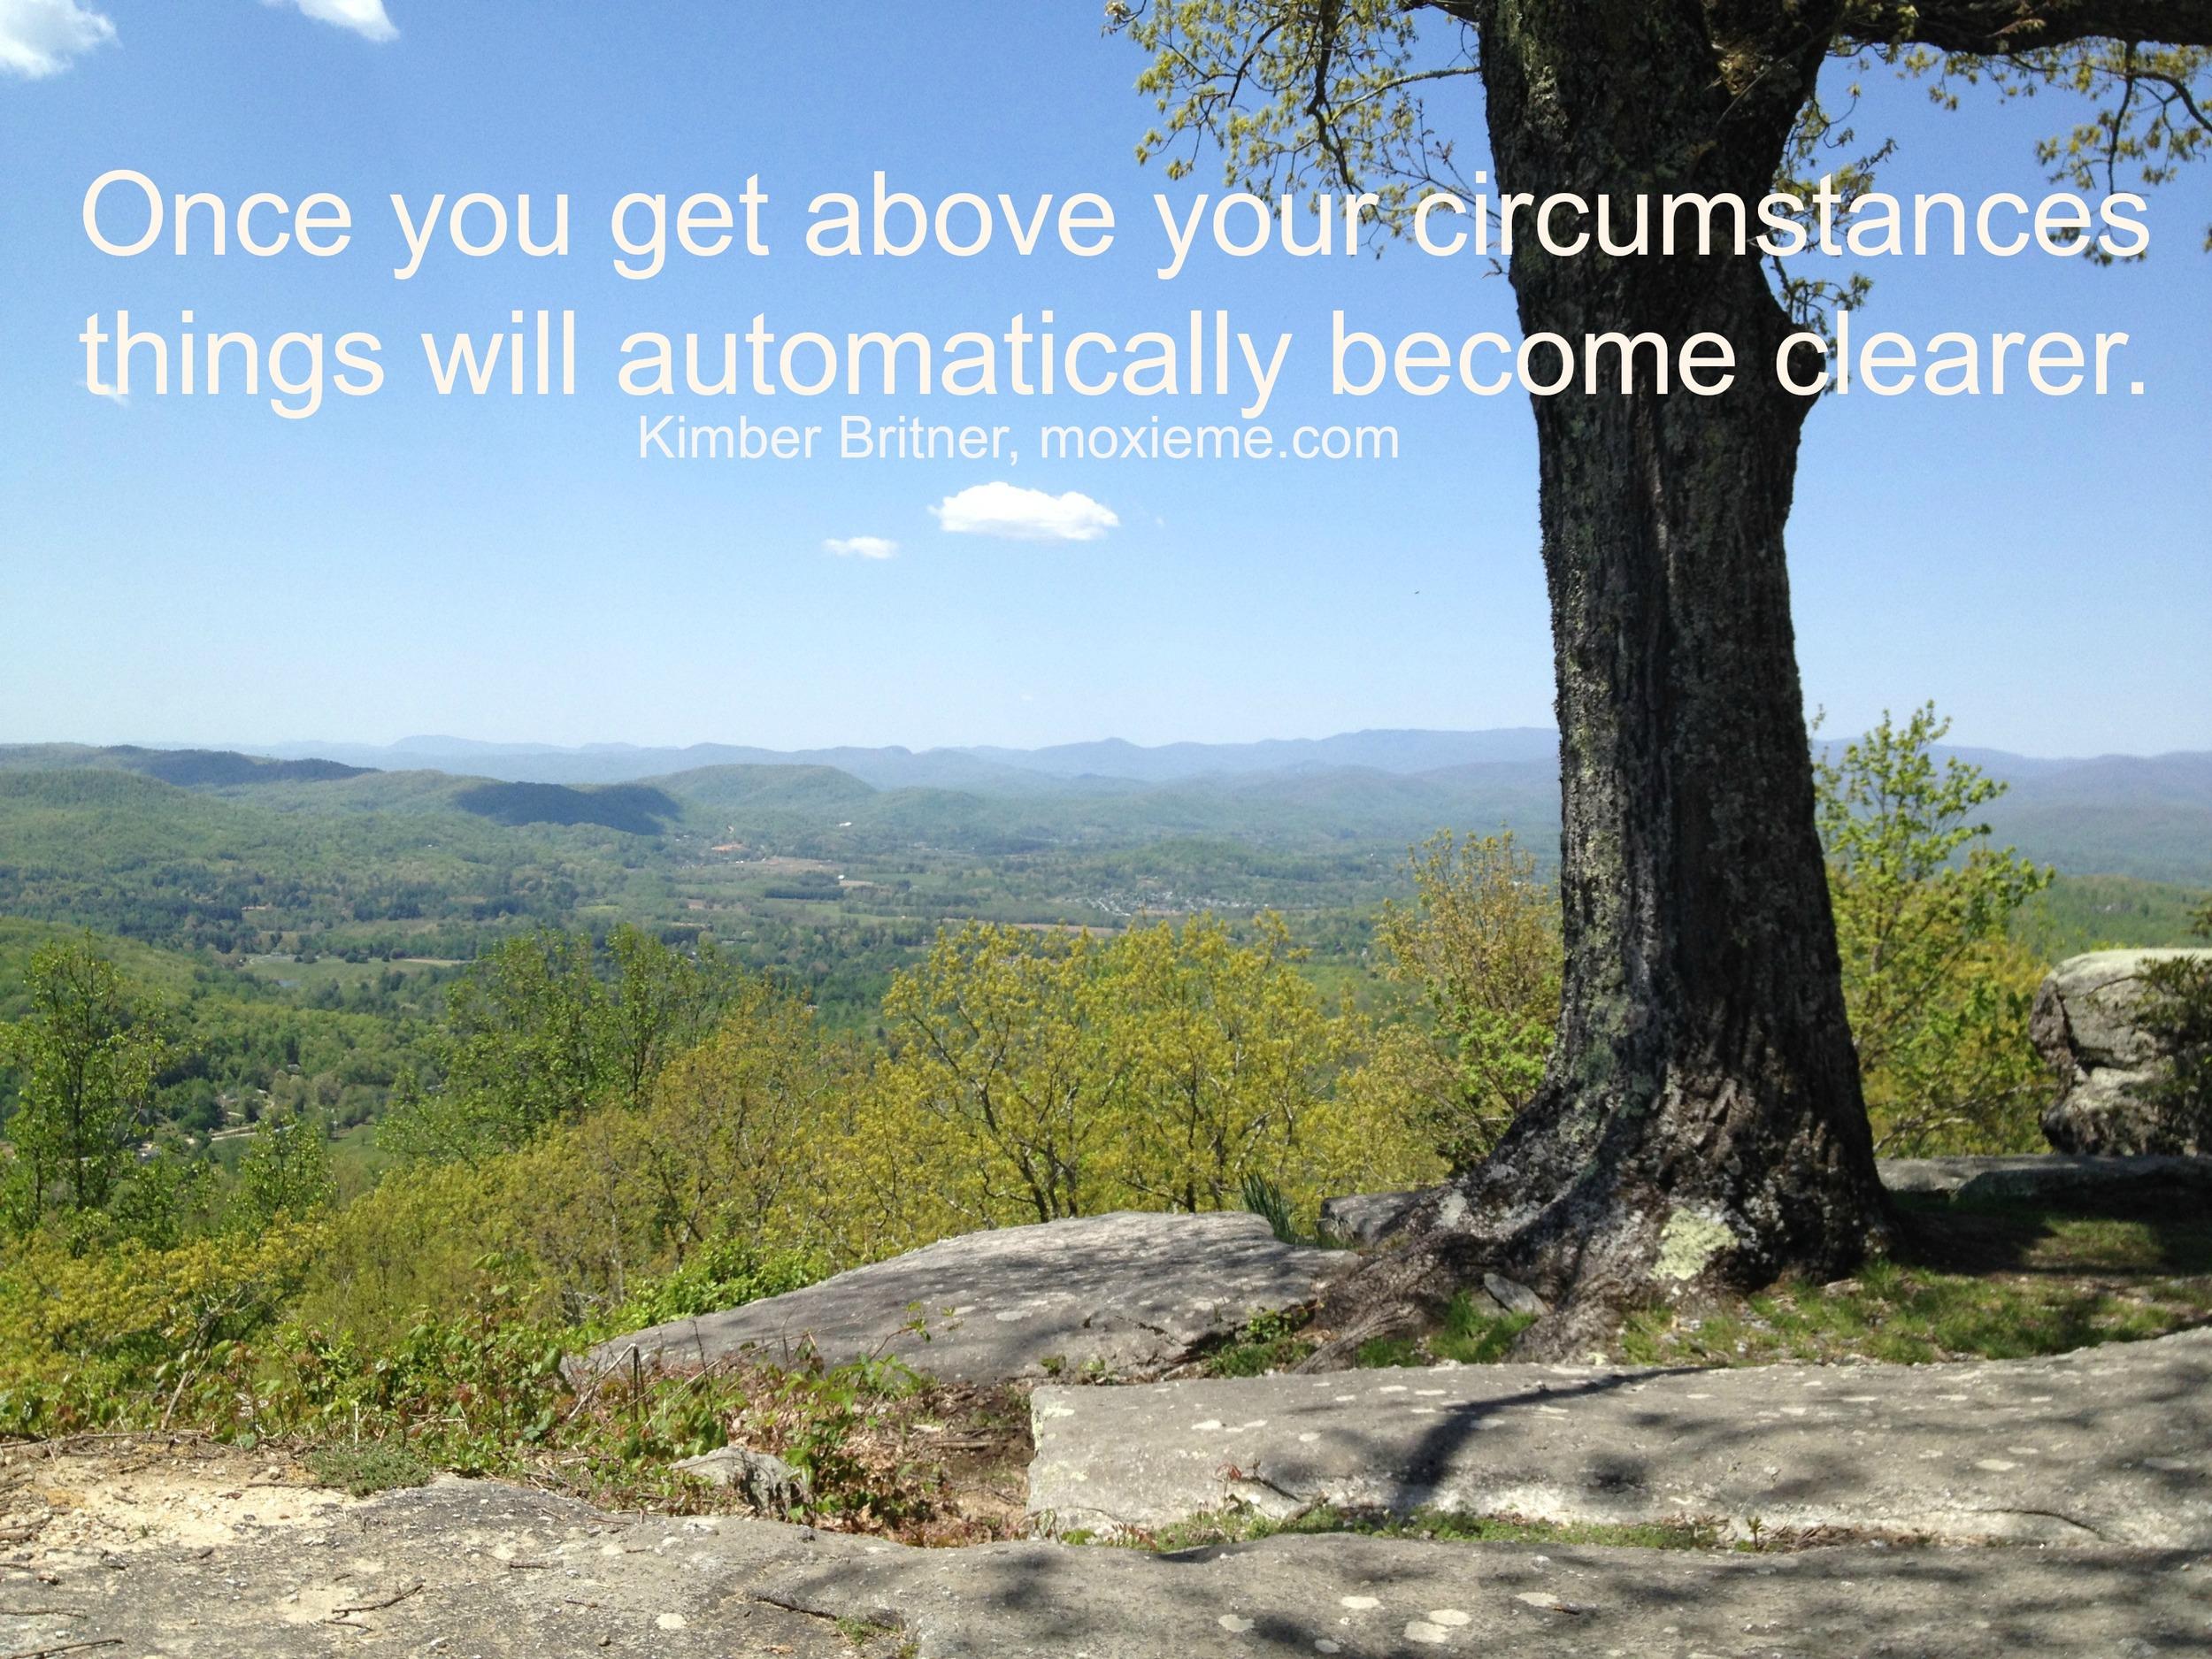 Above circumstances